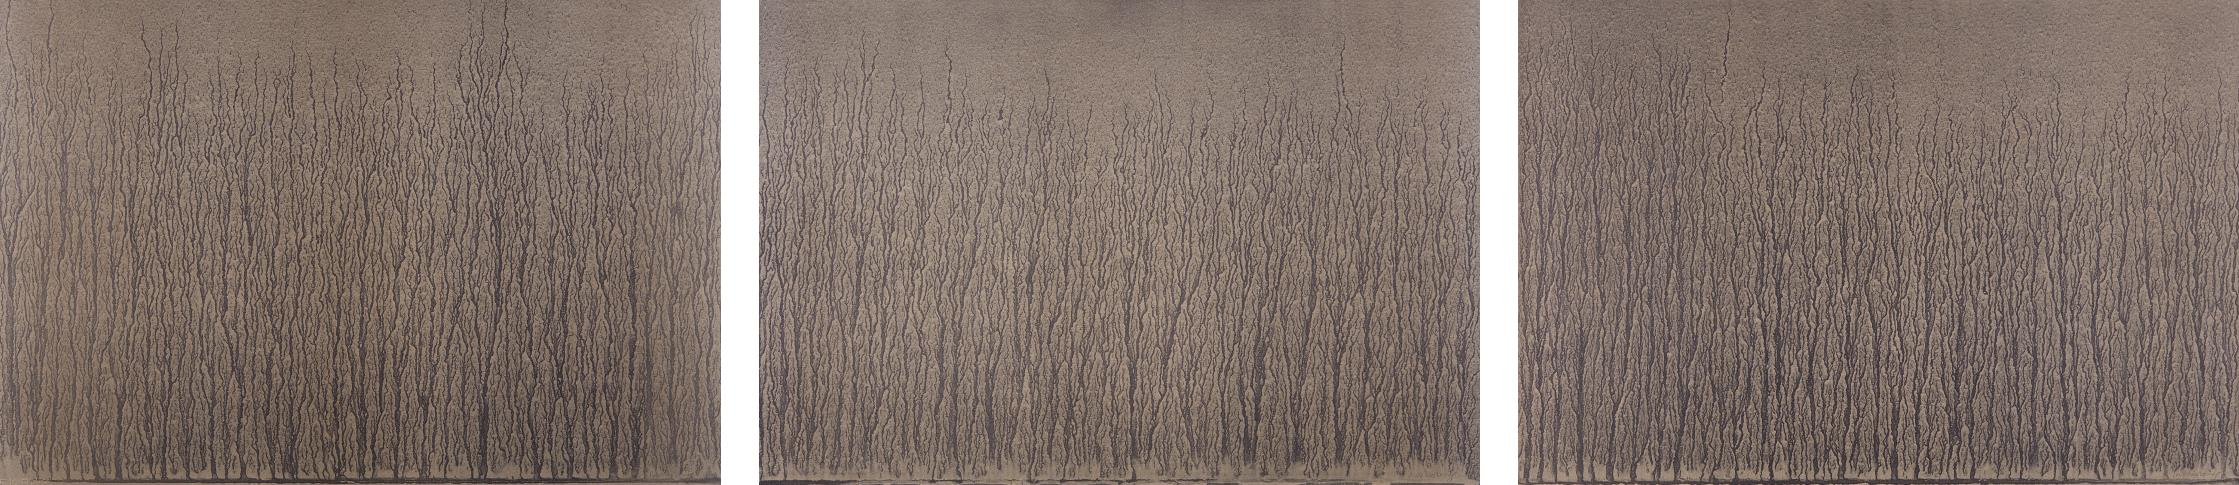 Richard Long-River Avon Mud Drawings-1989